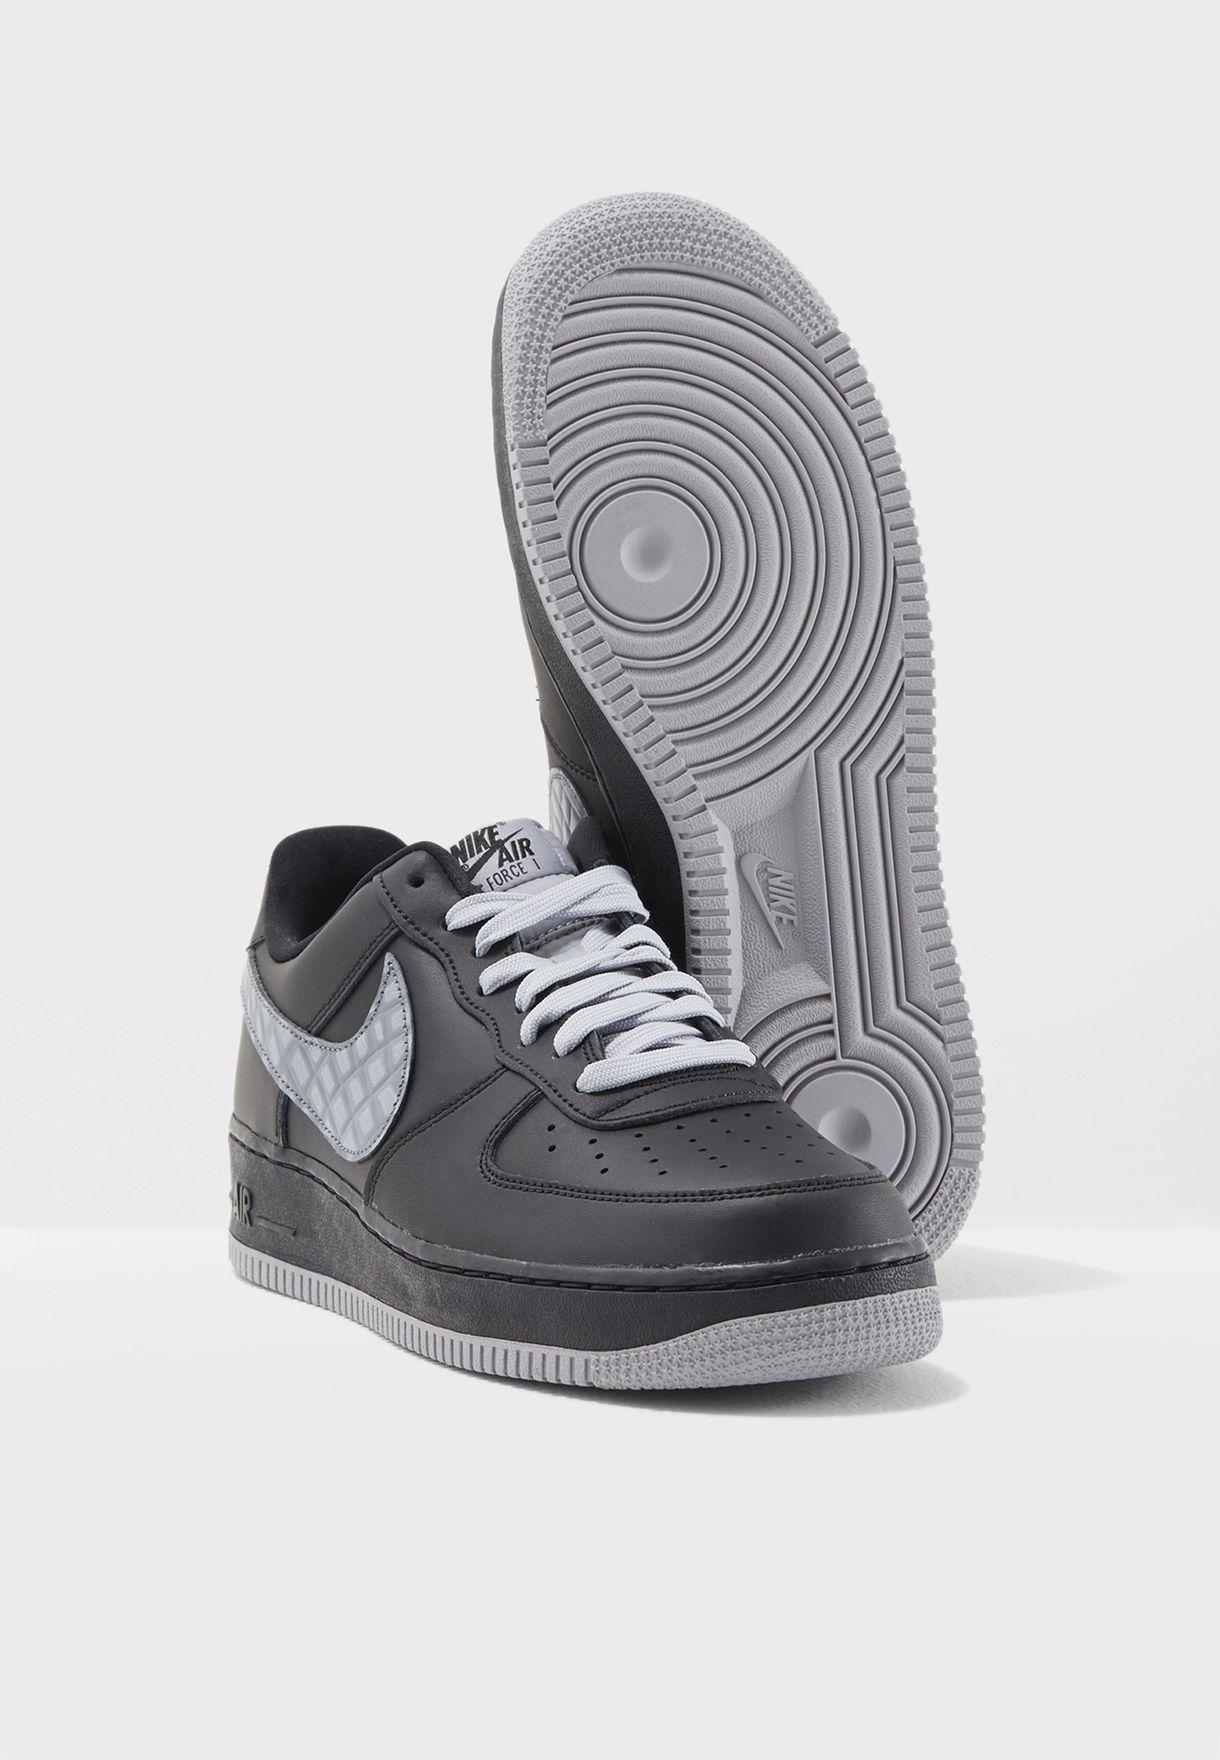 Force 012 '07 823511 Lv8 Men Air Nike For 1 Shop In Black 5Rj4Aq3L